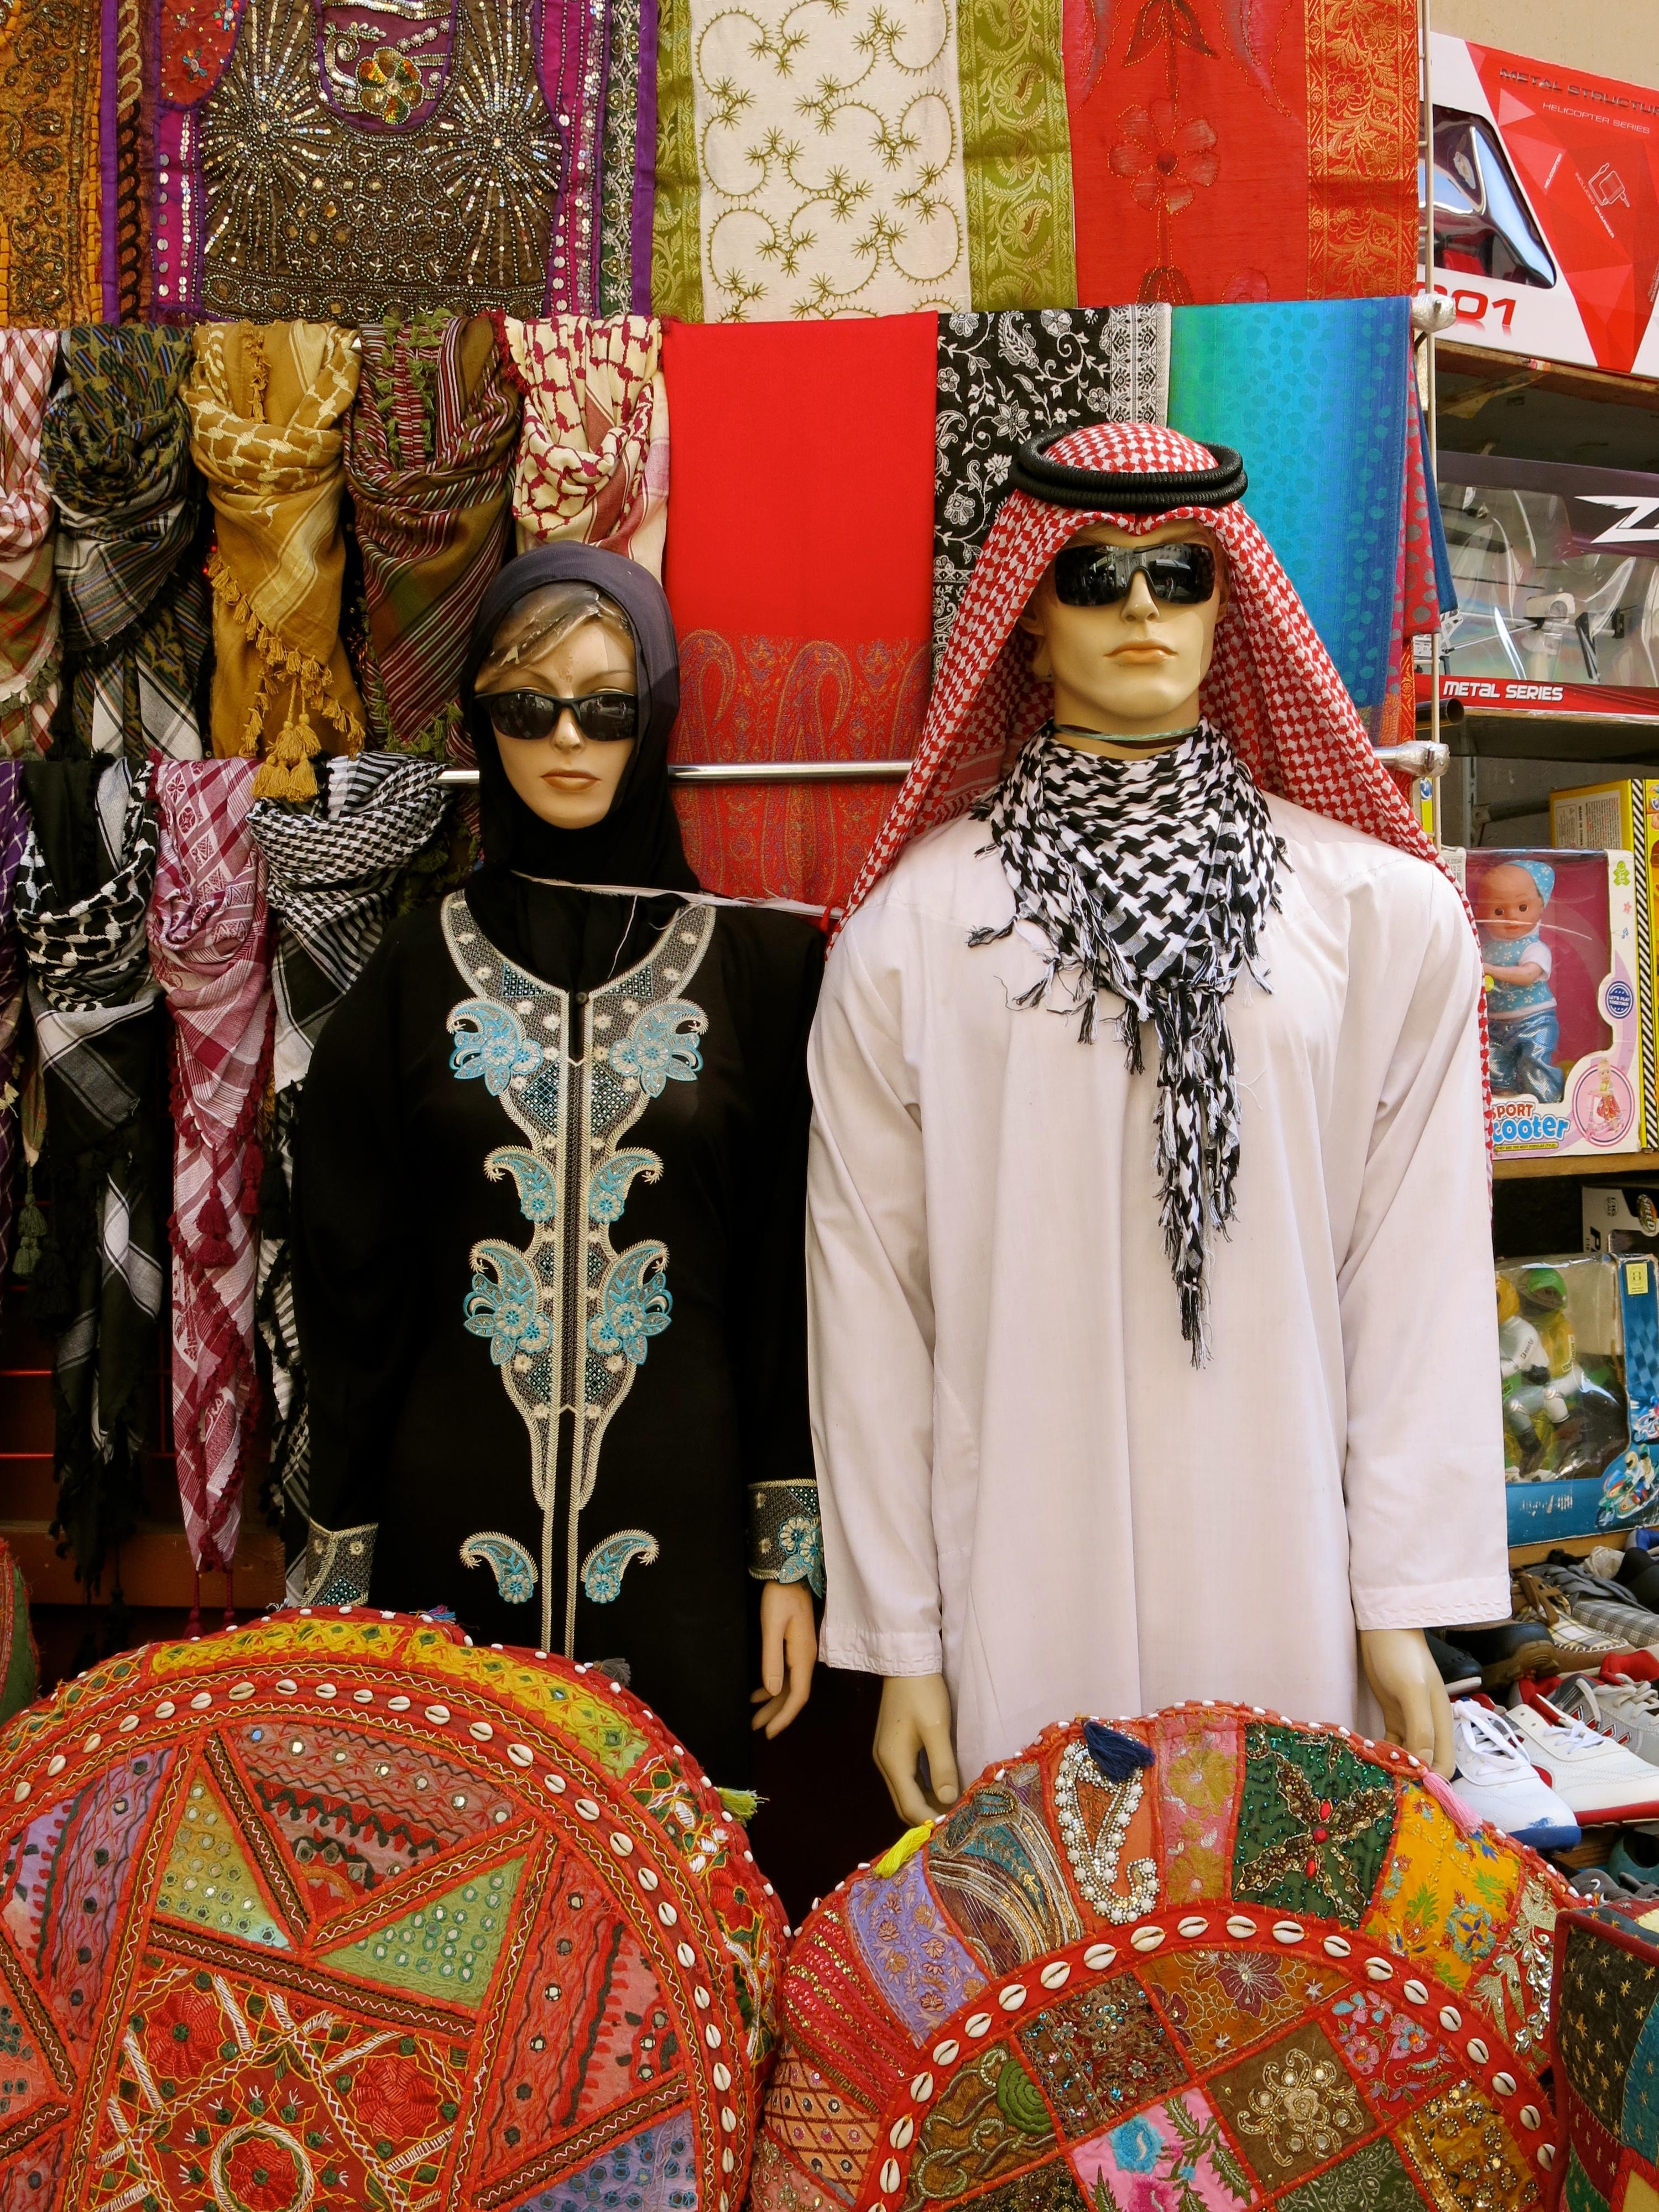 Souks Dubai Uae